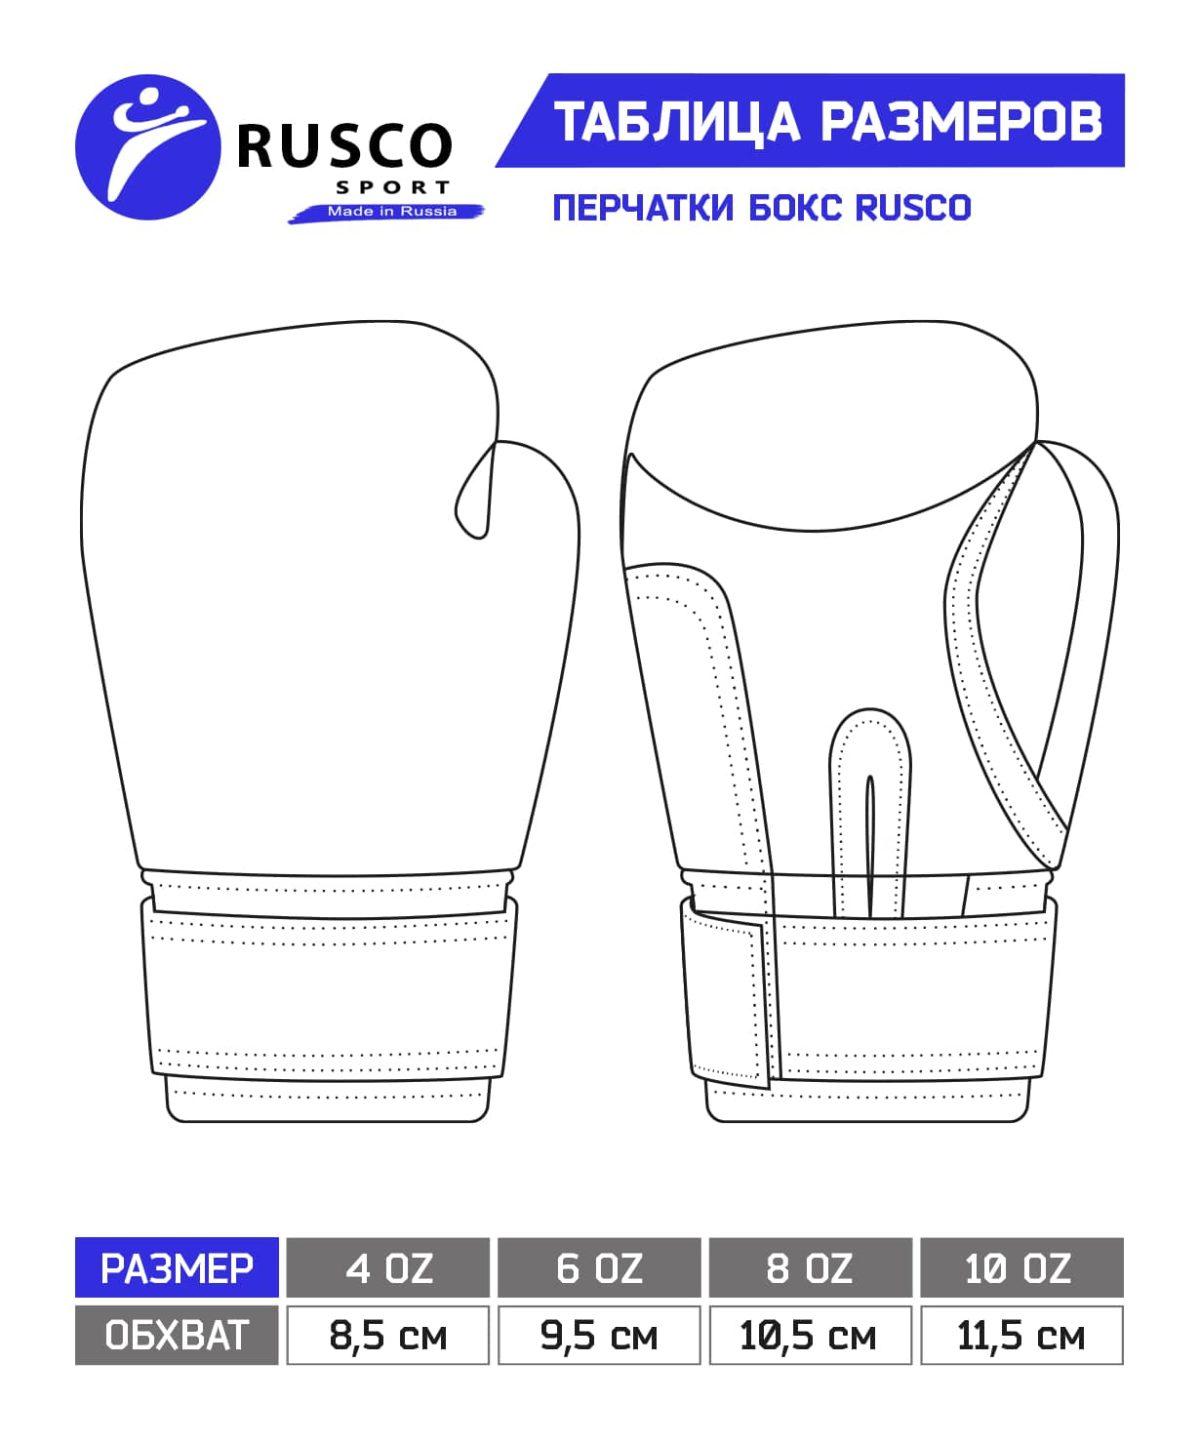 RUSCO Перчатки бокс. 6oz, к/з  18528 - 2